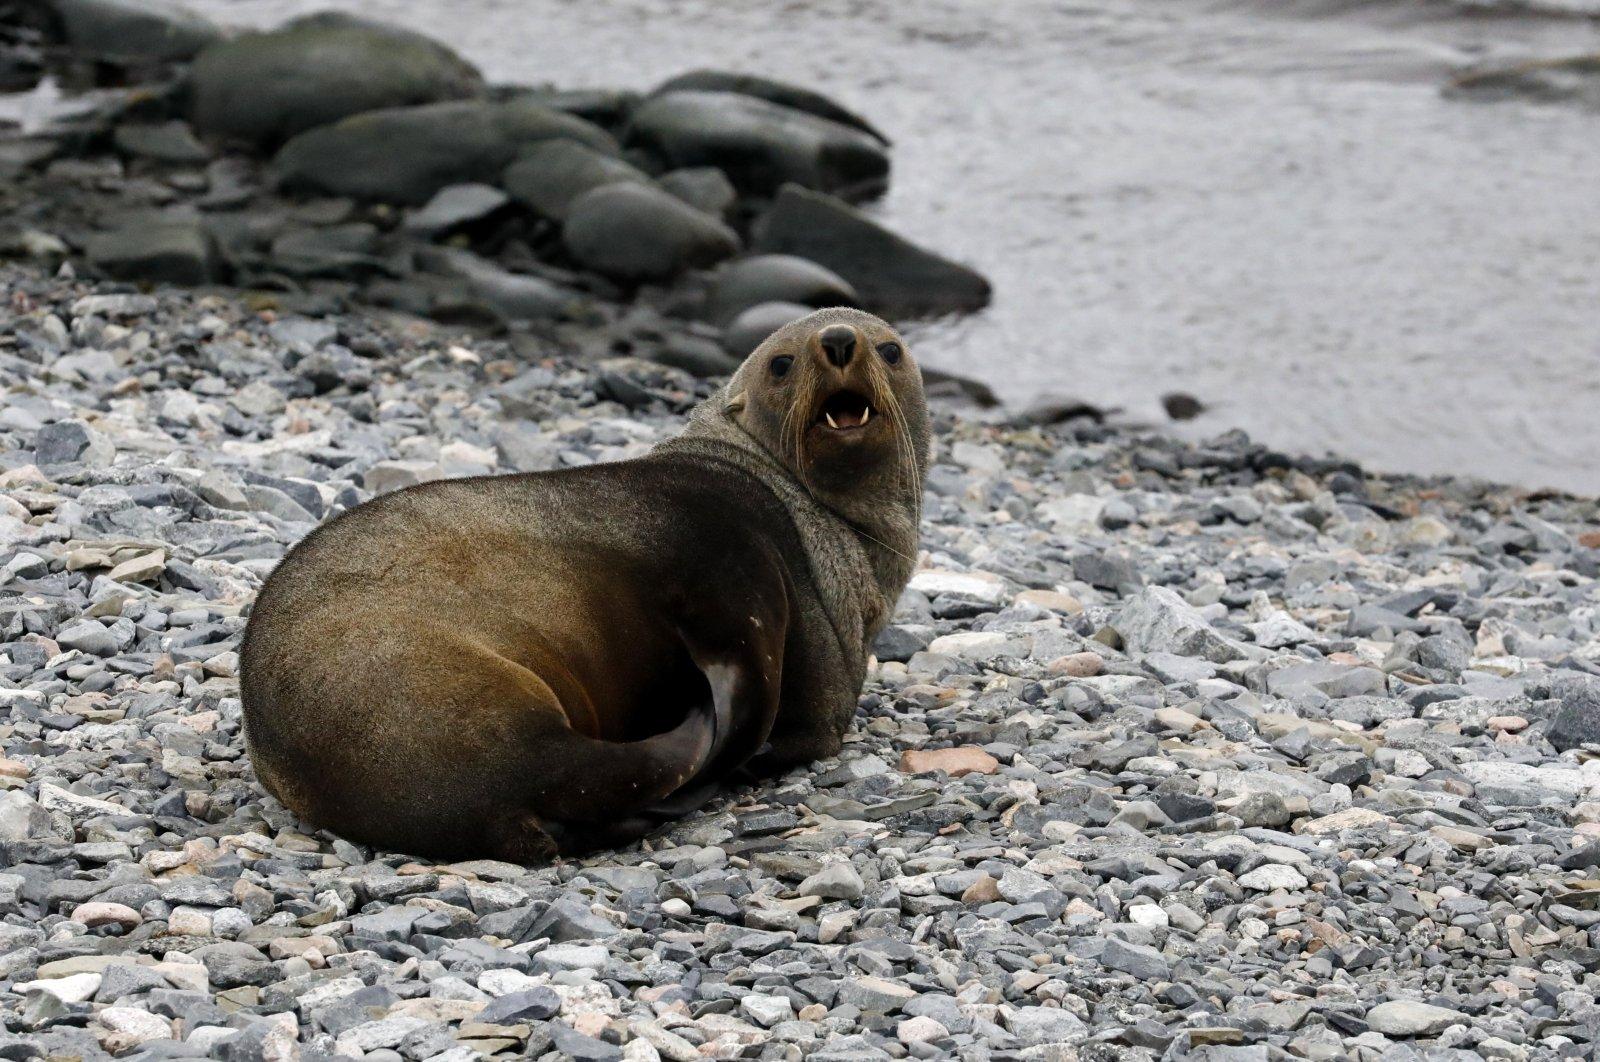 Two seals greeted the team at Horseshoe Island. (Photo by Hayrettin Bektaş)